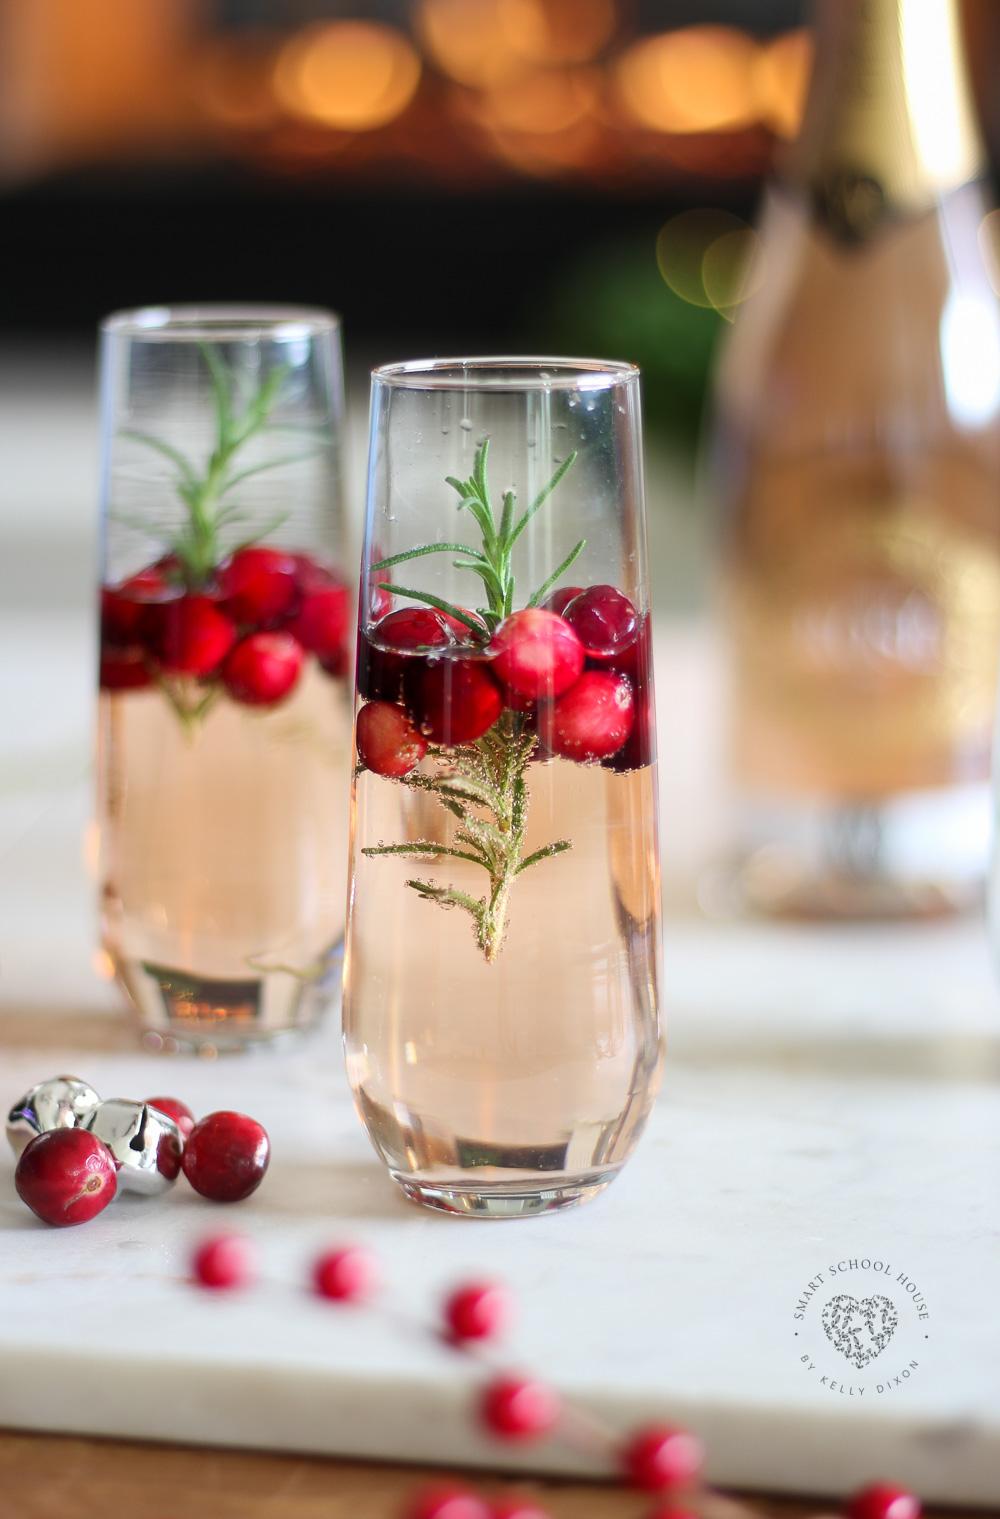 Christmas Sparkling Rosé & Delicious Appetizer Idea #ChristmasDrinks #ChristmasCocktails #ChristmasAppetizers #ChristmasPartyIdeas